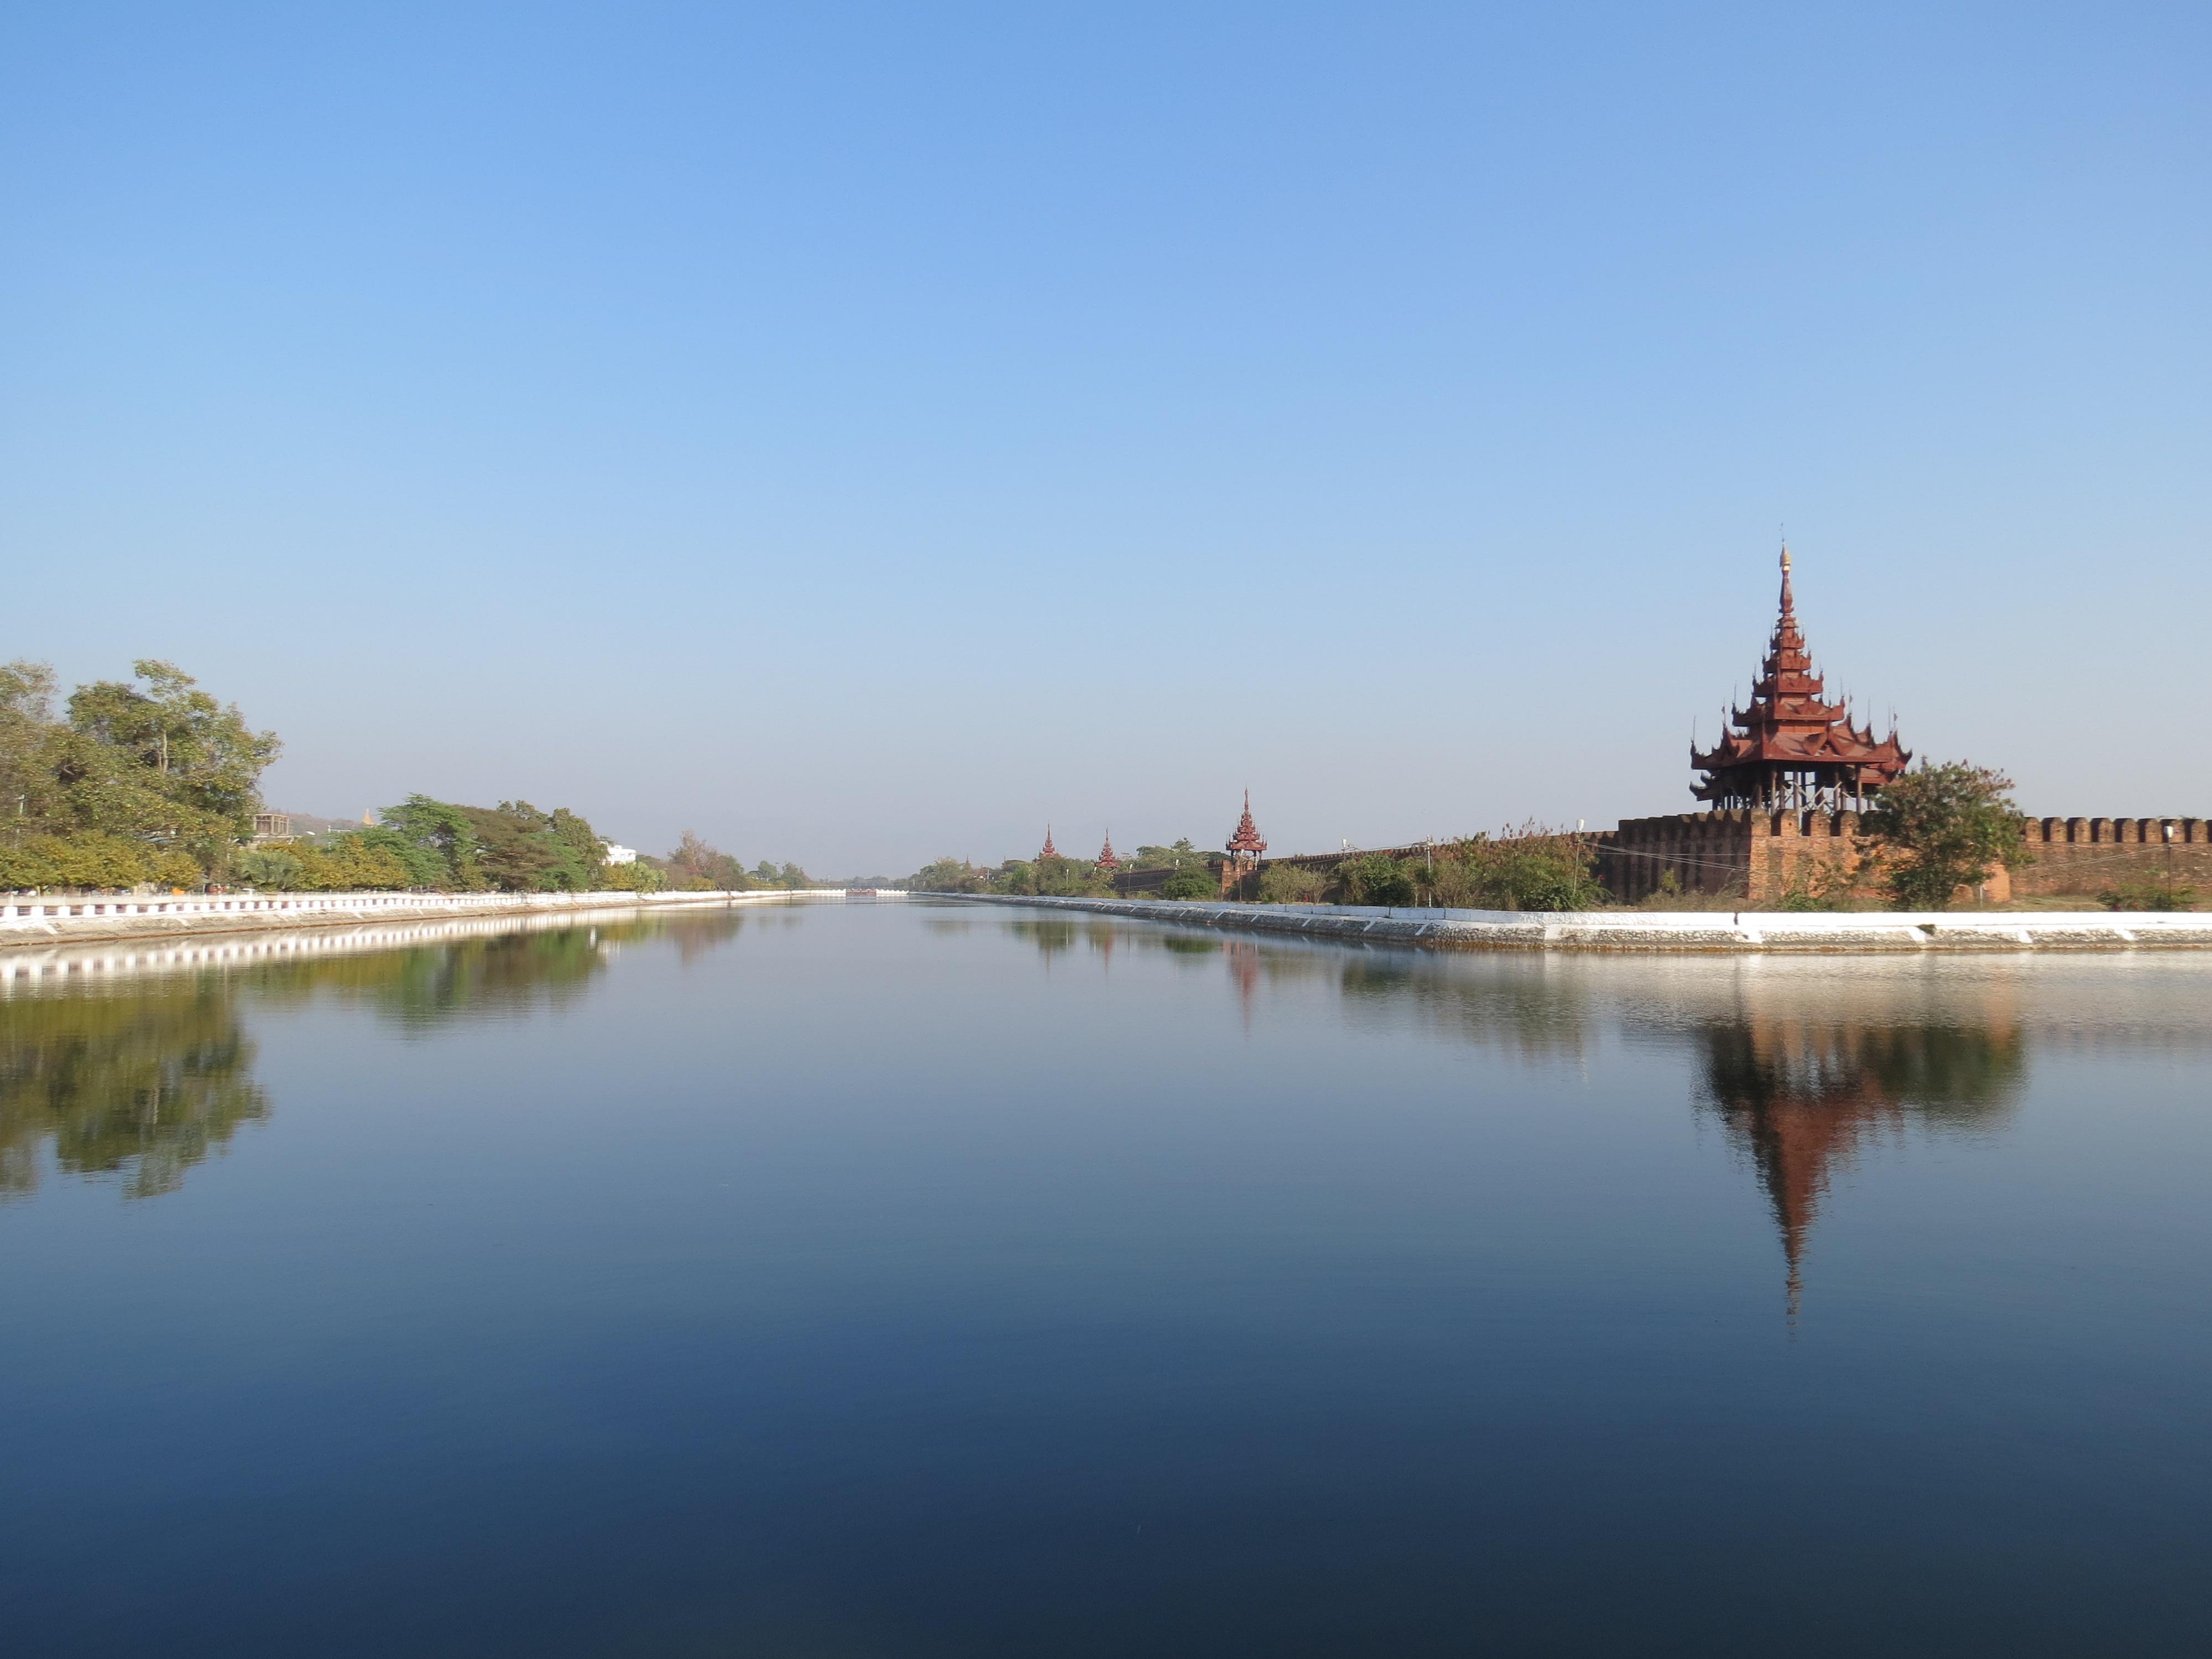 Mandalay Myanmar  city photos gallery : Category Archives: Myanmar